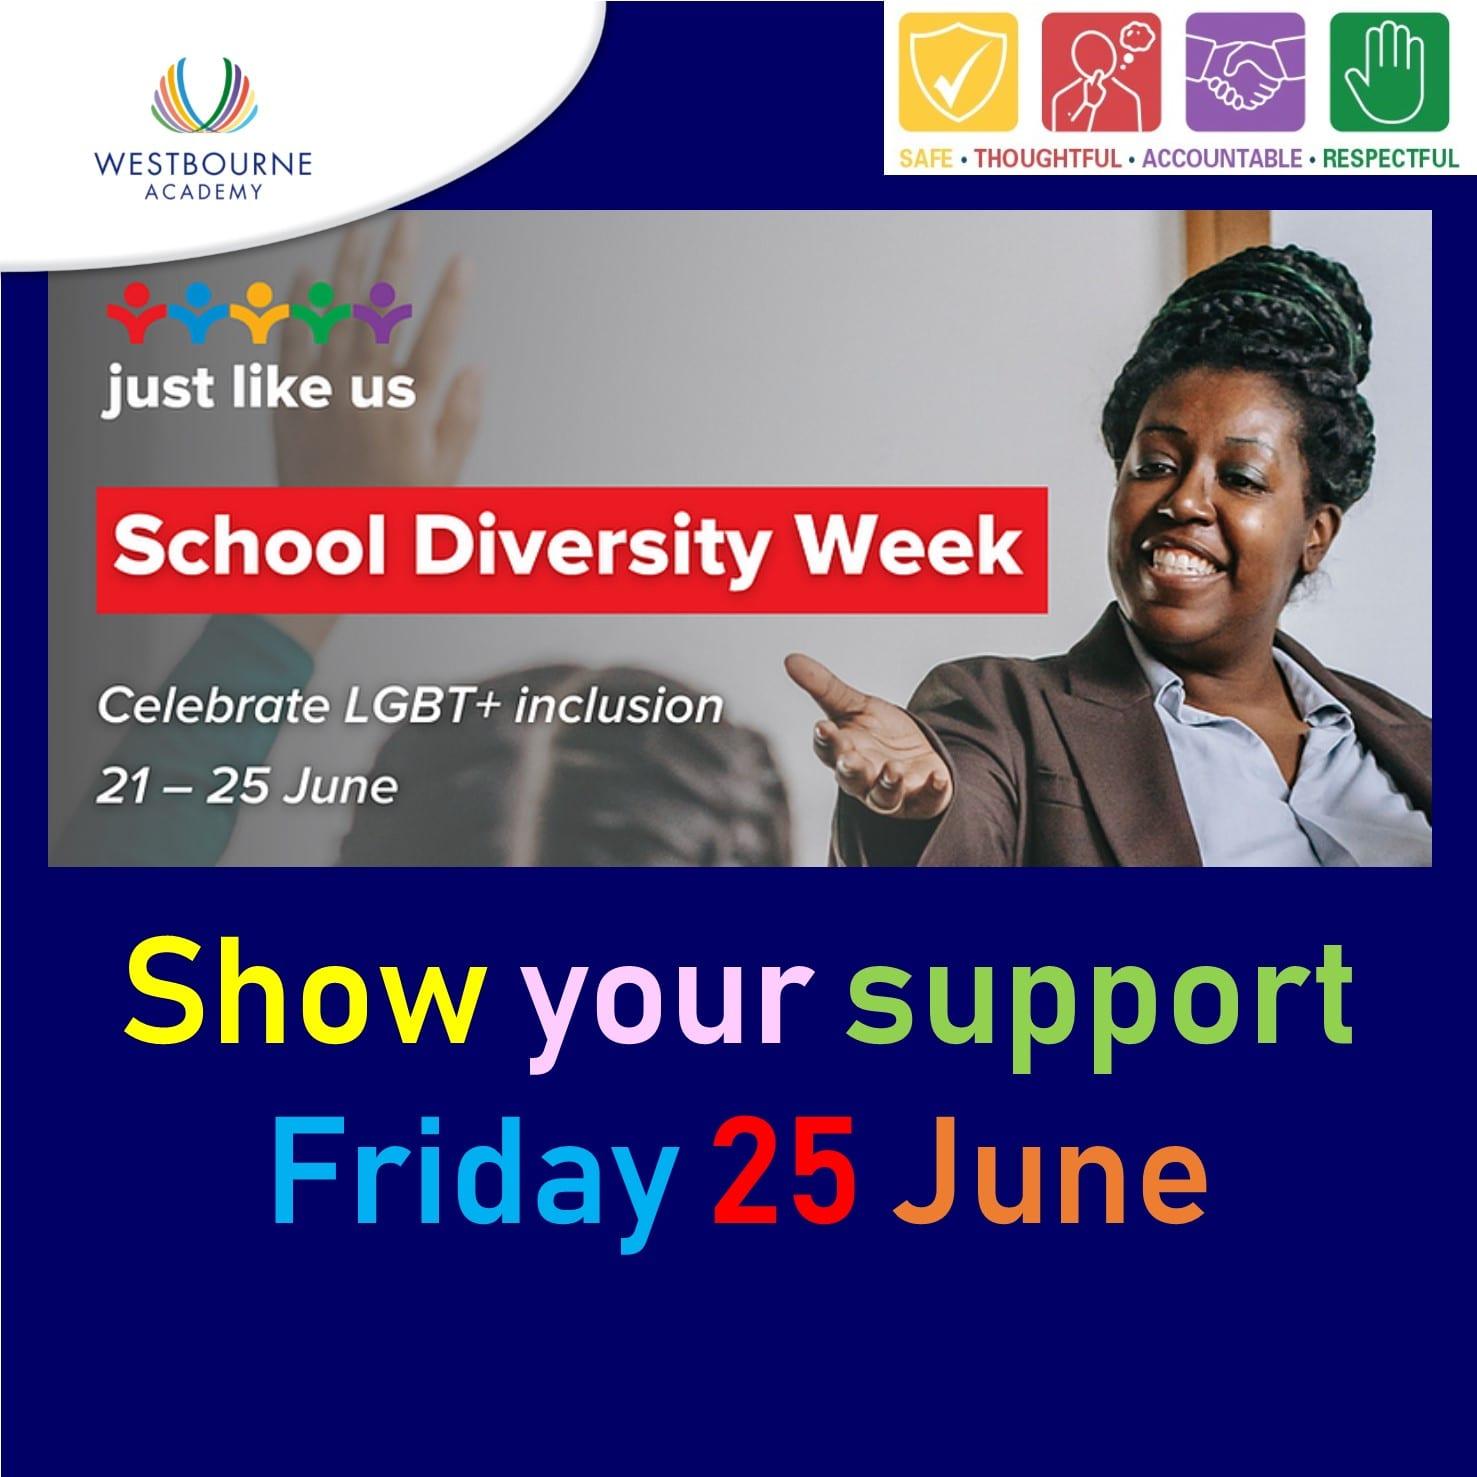 School Diversity Week Friday 25 June